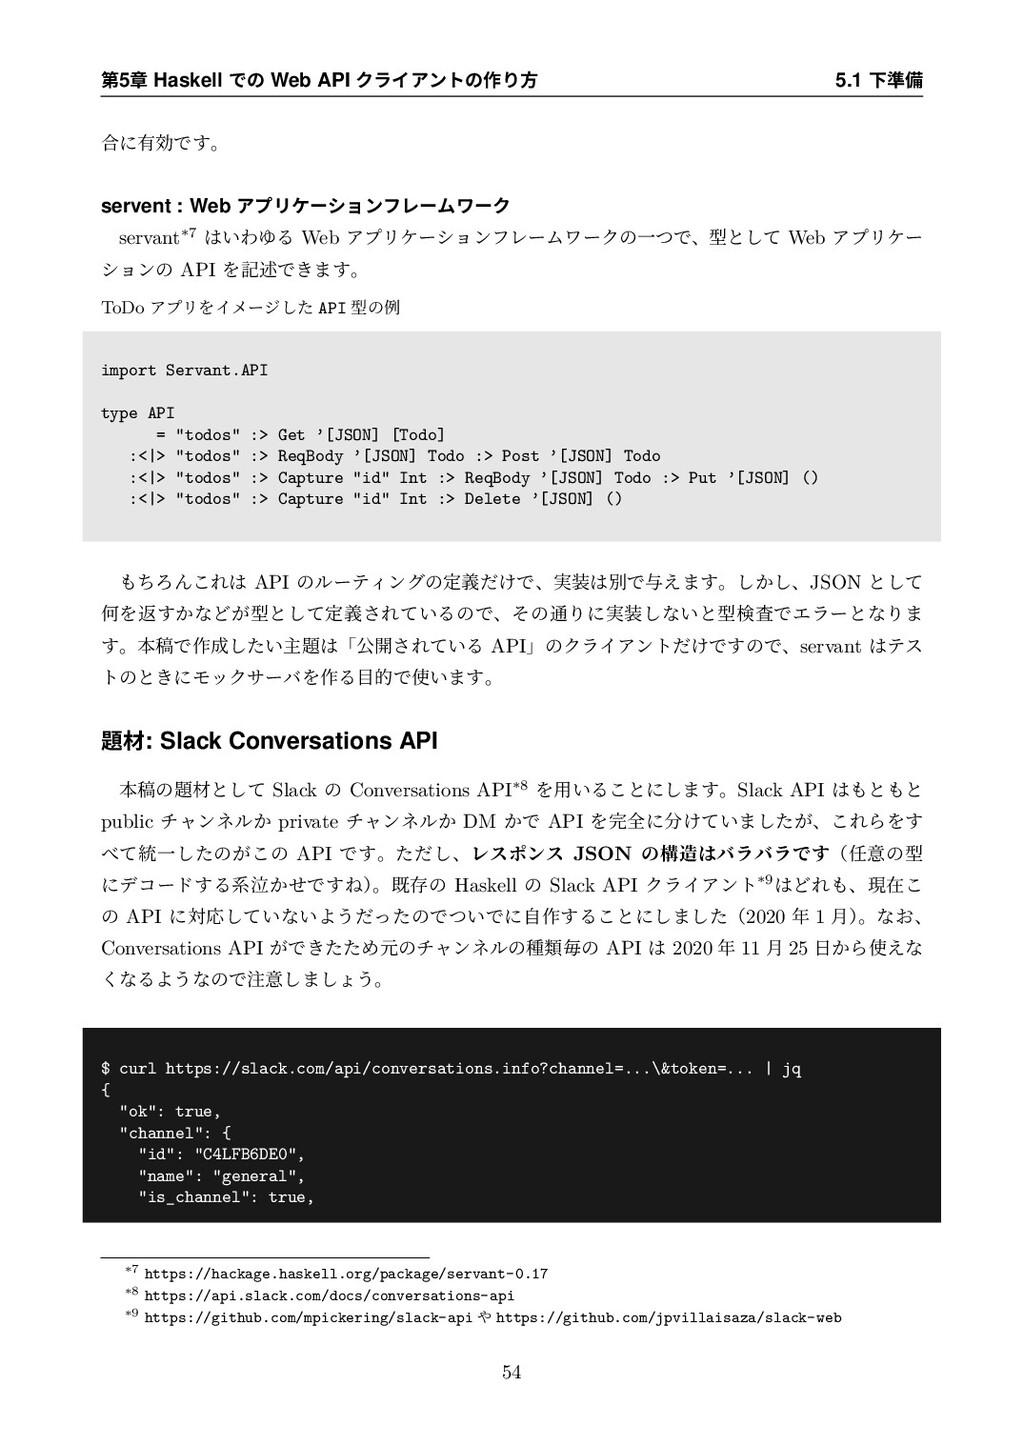 ୈ5ষ Haskell Ͱͷ Web API ΫϥΠΞϯτͷ࡞Γํ 5.1 Լ४උ ߹ʹ༗ޮͰ...